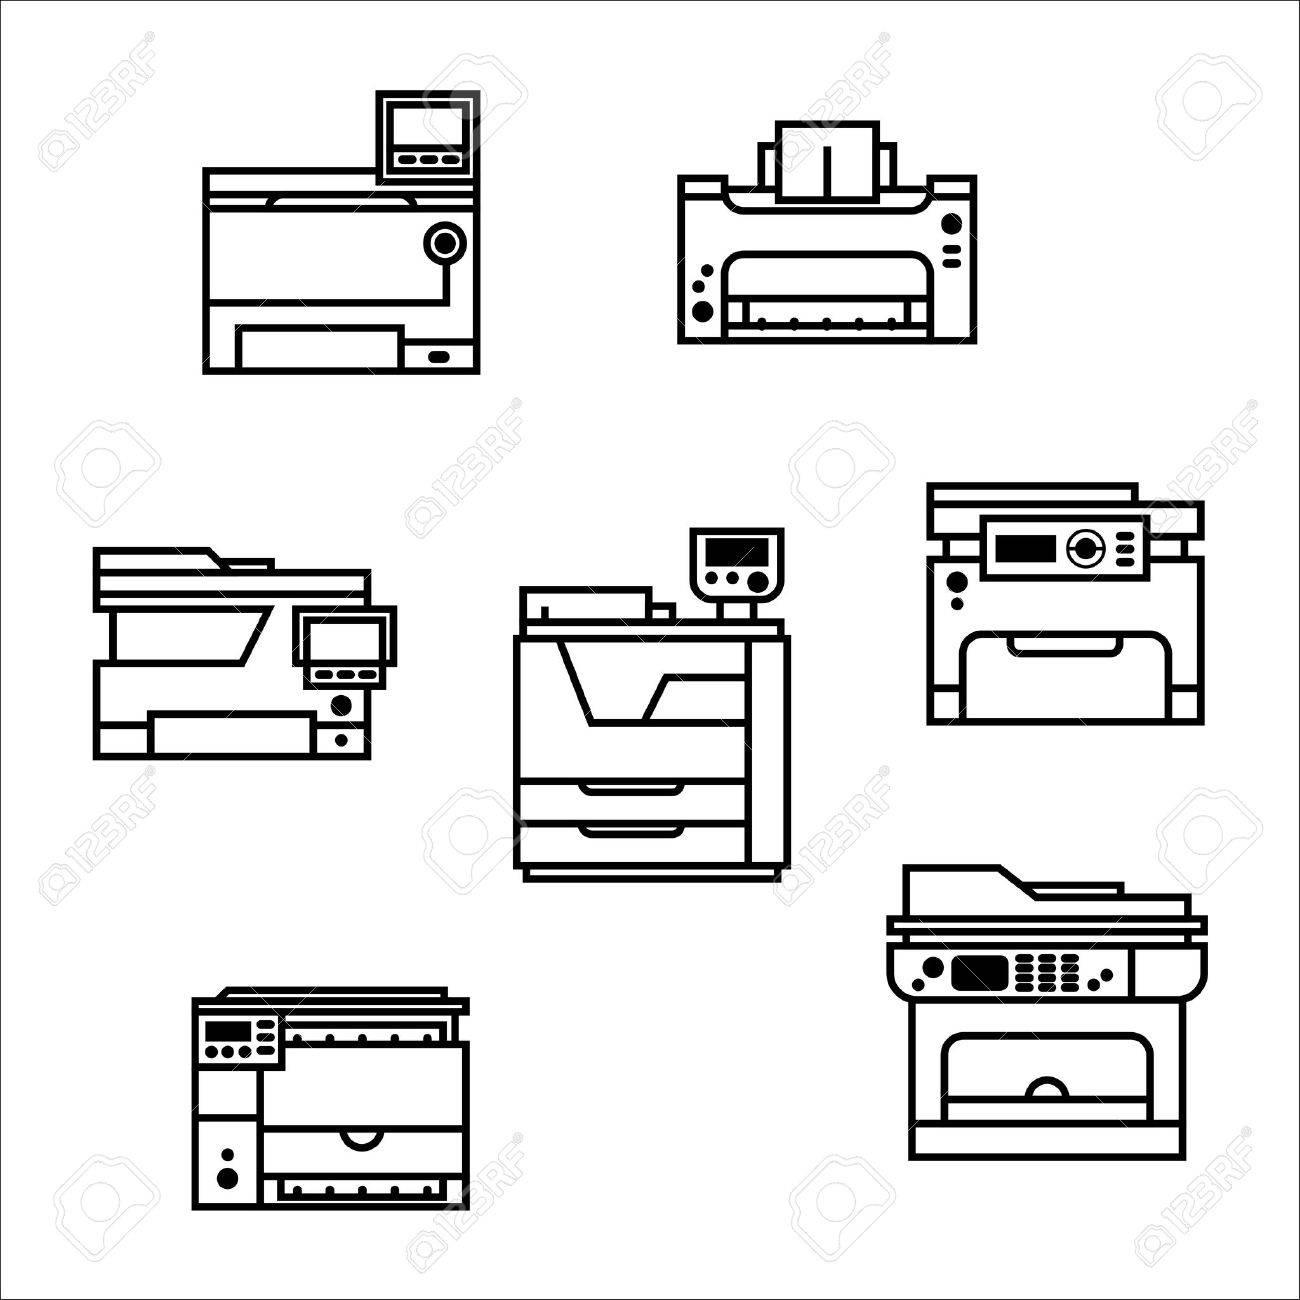 Duilawyerlosangeles Free Color Printing Eliolera Com